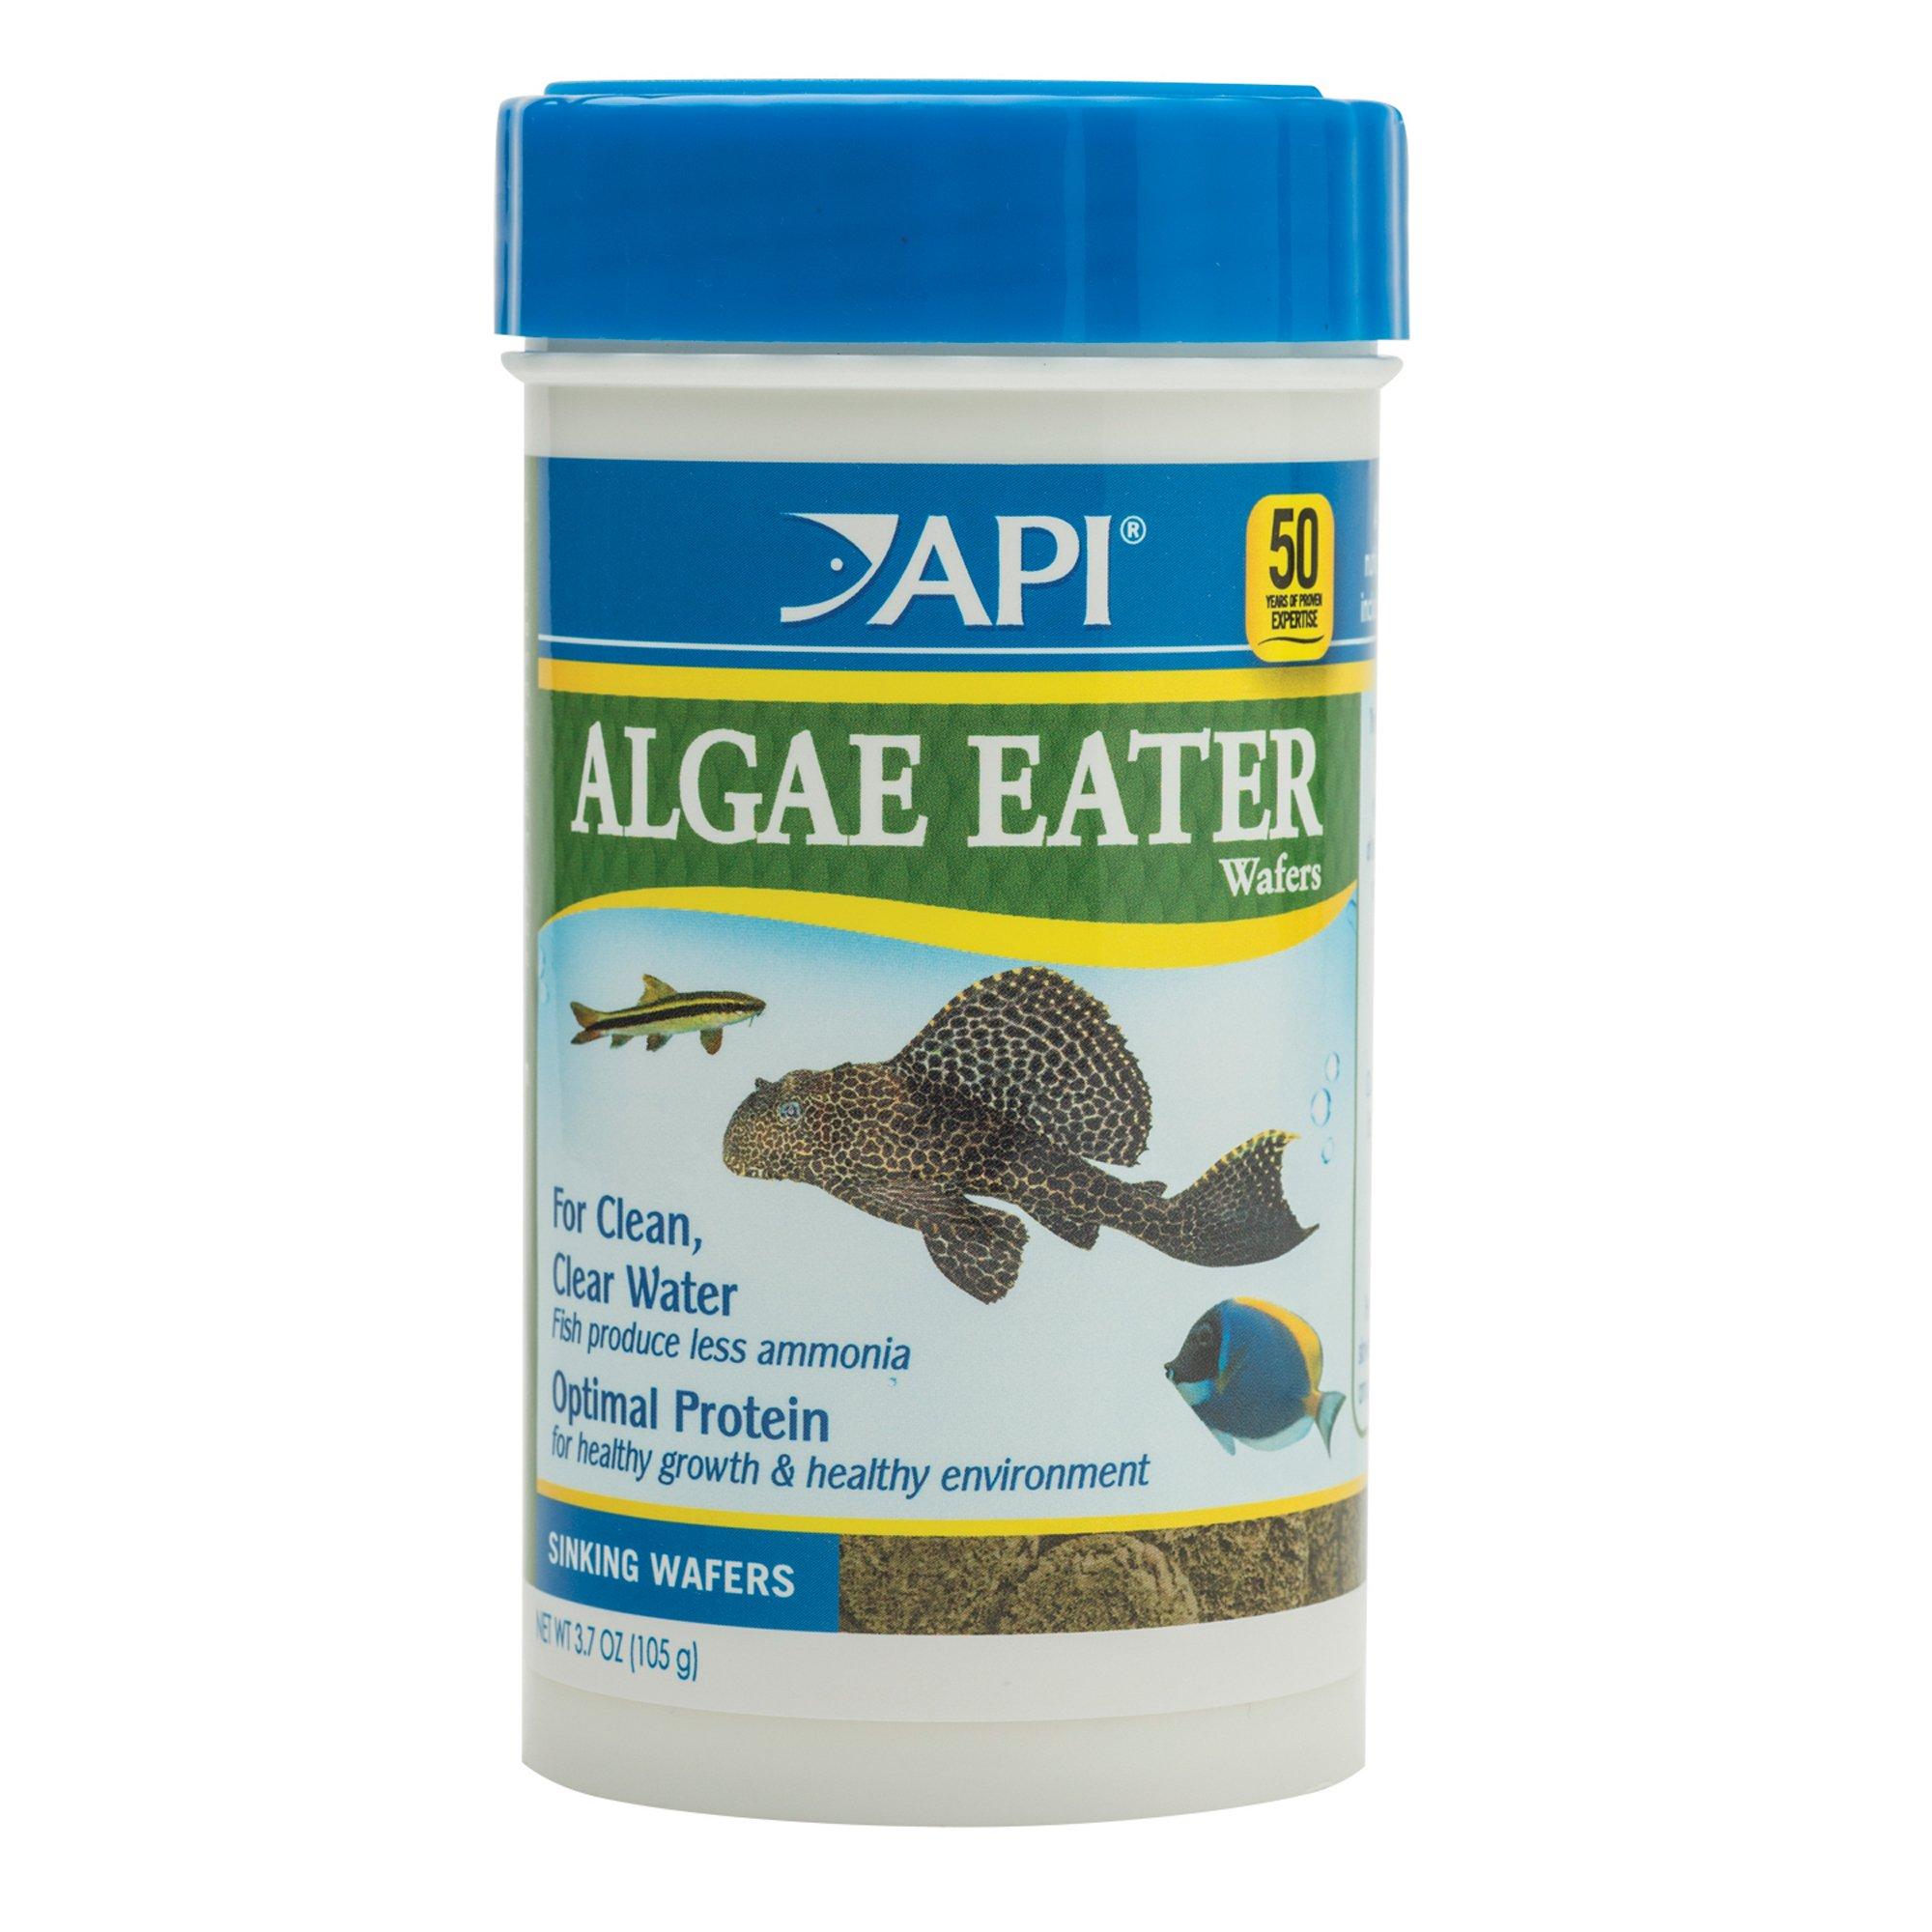 Api algae eater wafers algae wafer fish food petco for Petco fish food